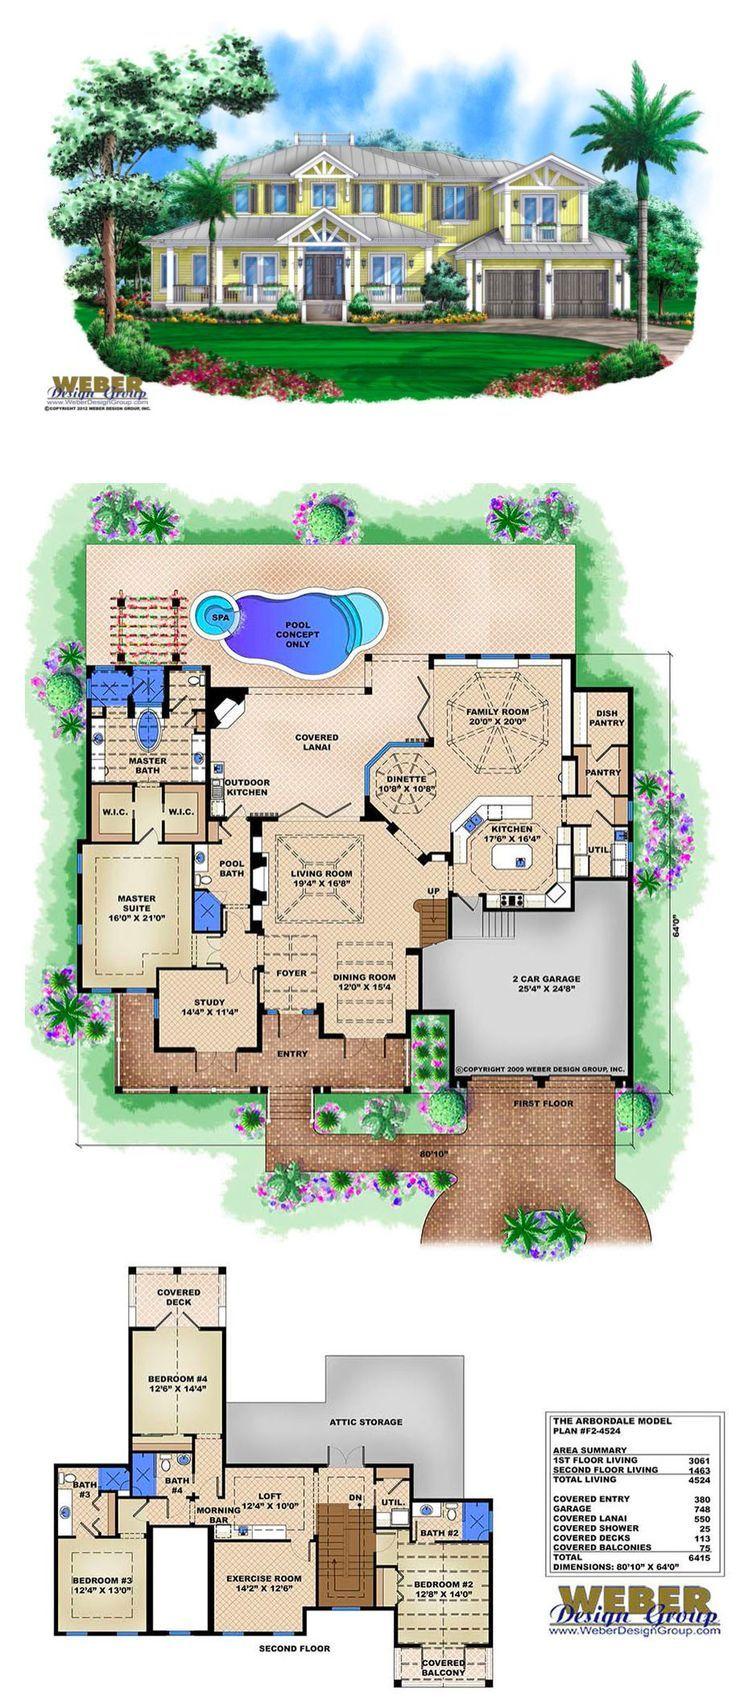 Coastal House Plan Old Florida Style Key West Home Floor Plan House Plans Coastal House Plans Floor Plans